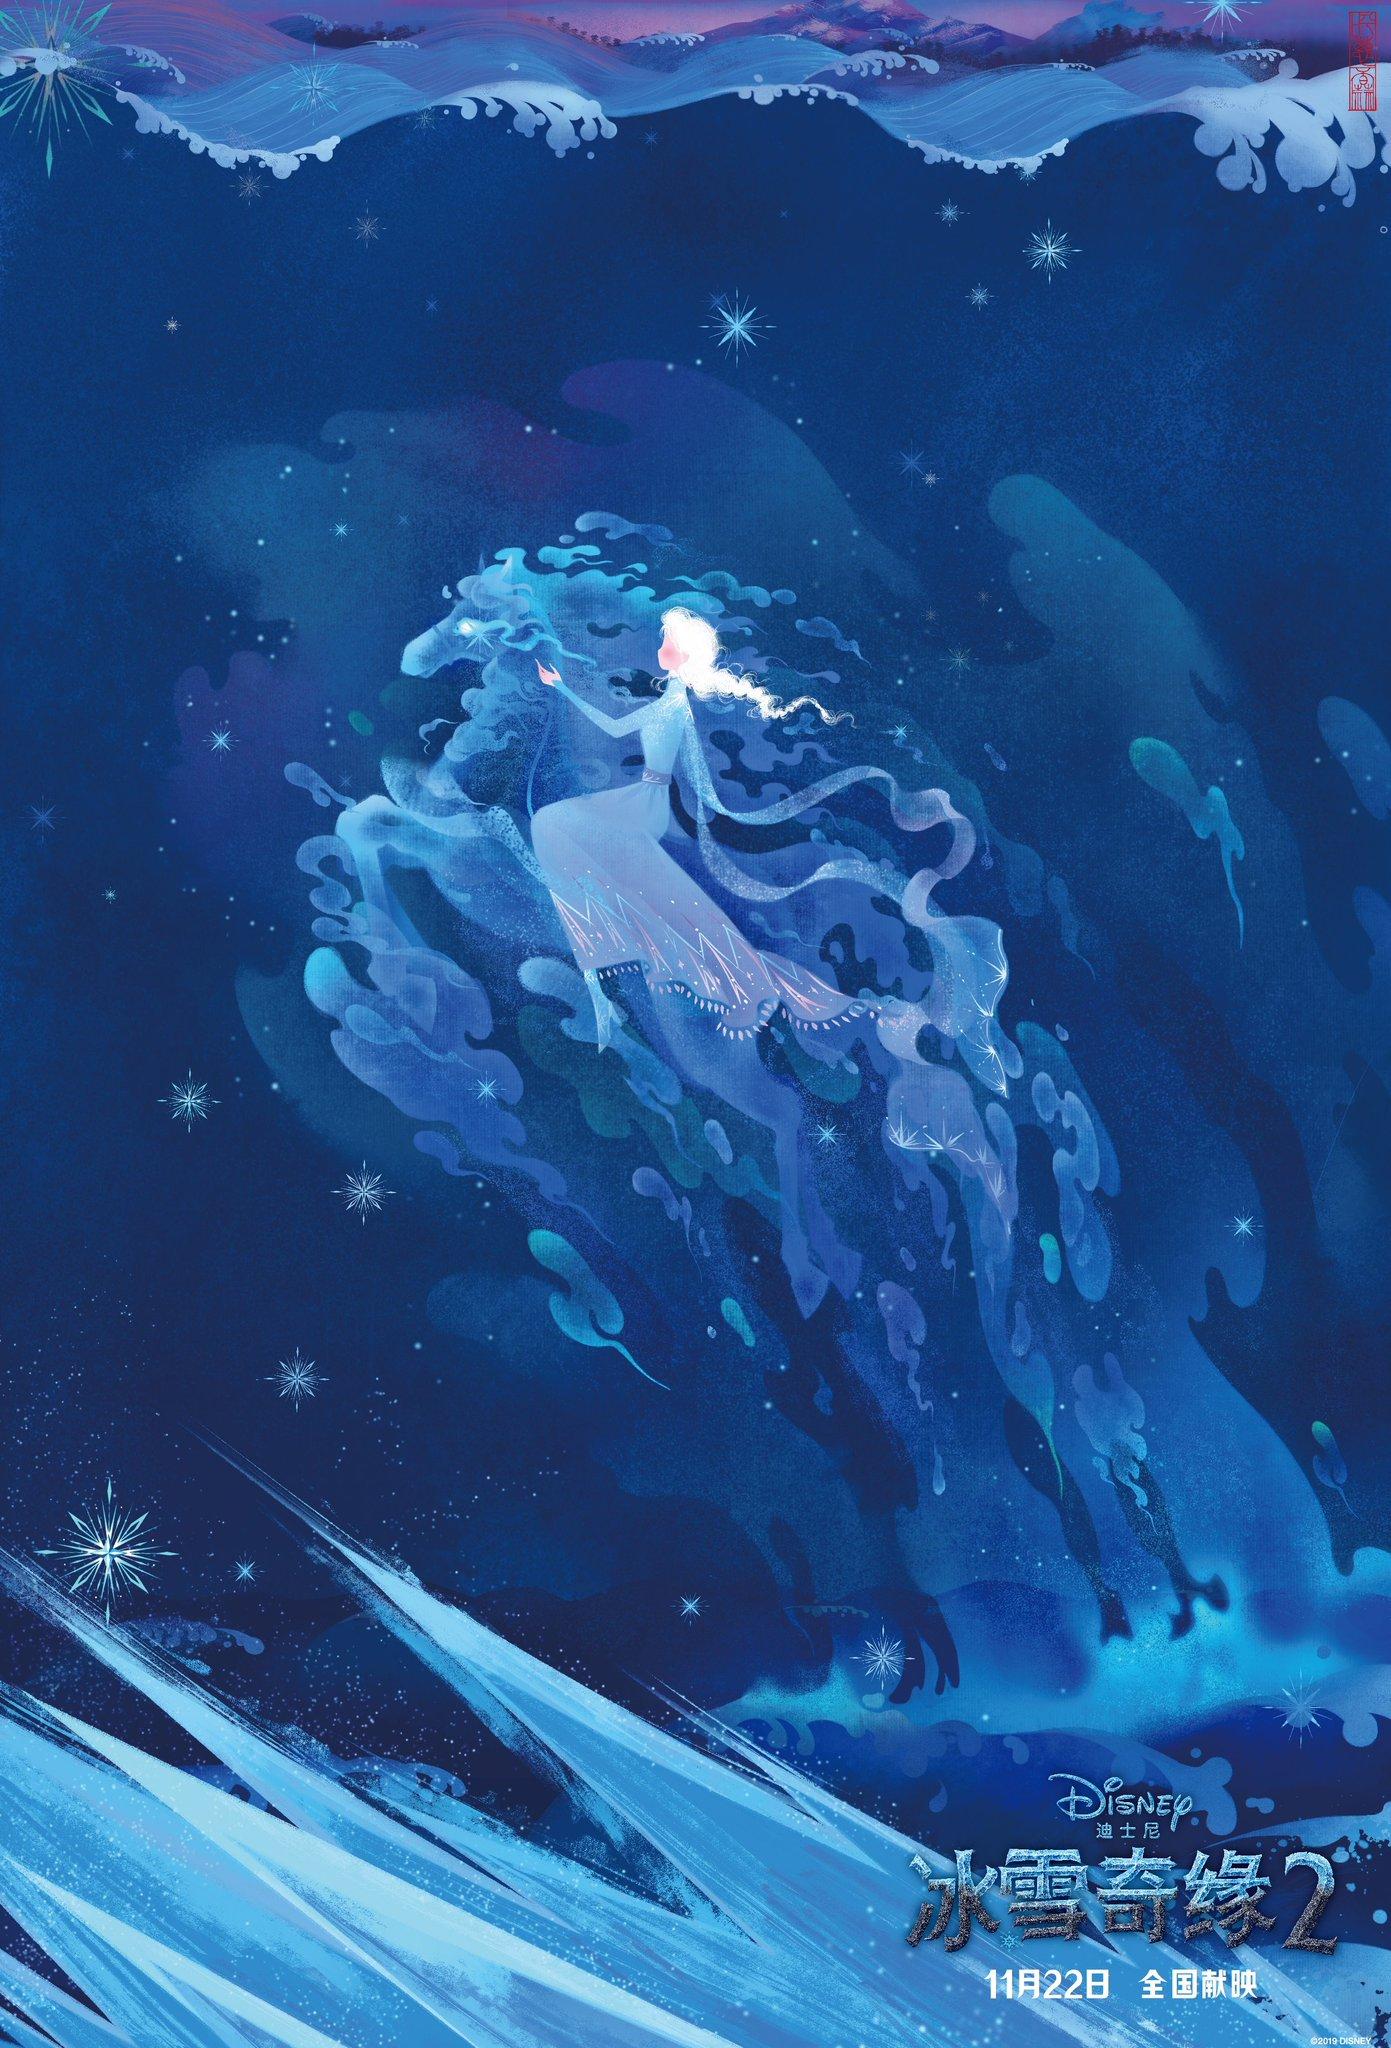 Frozen 2 Chinese Poster Frozen Photo 43109996 Fanpop